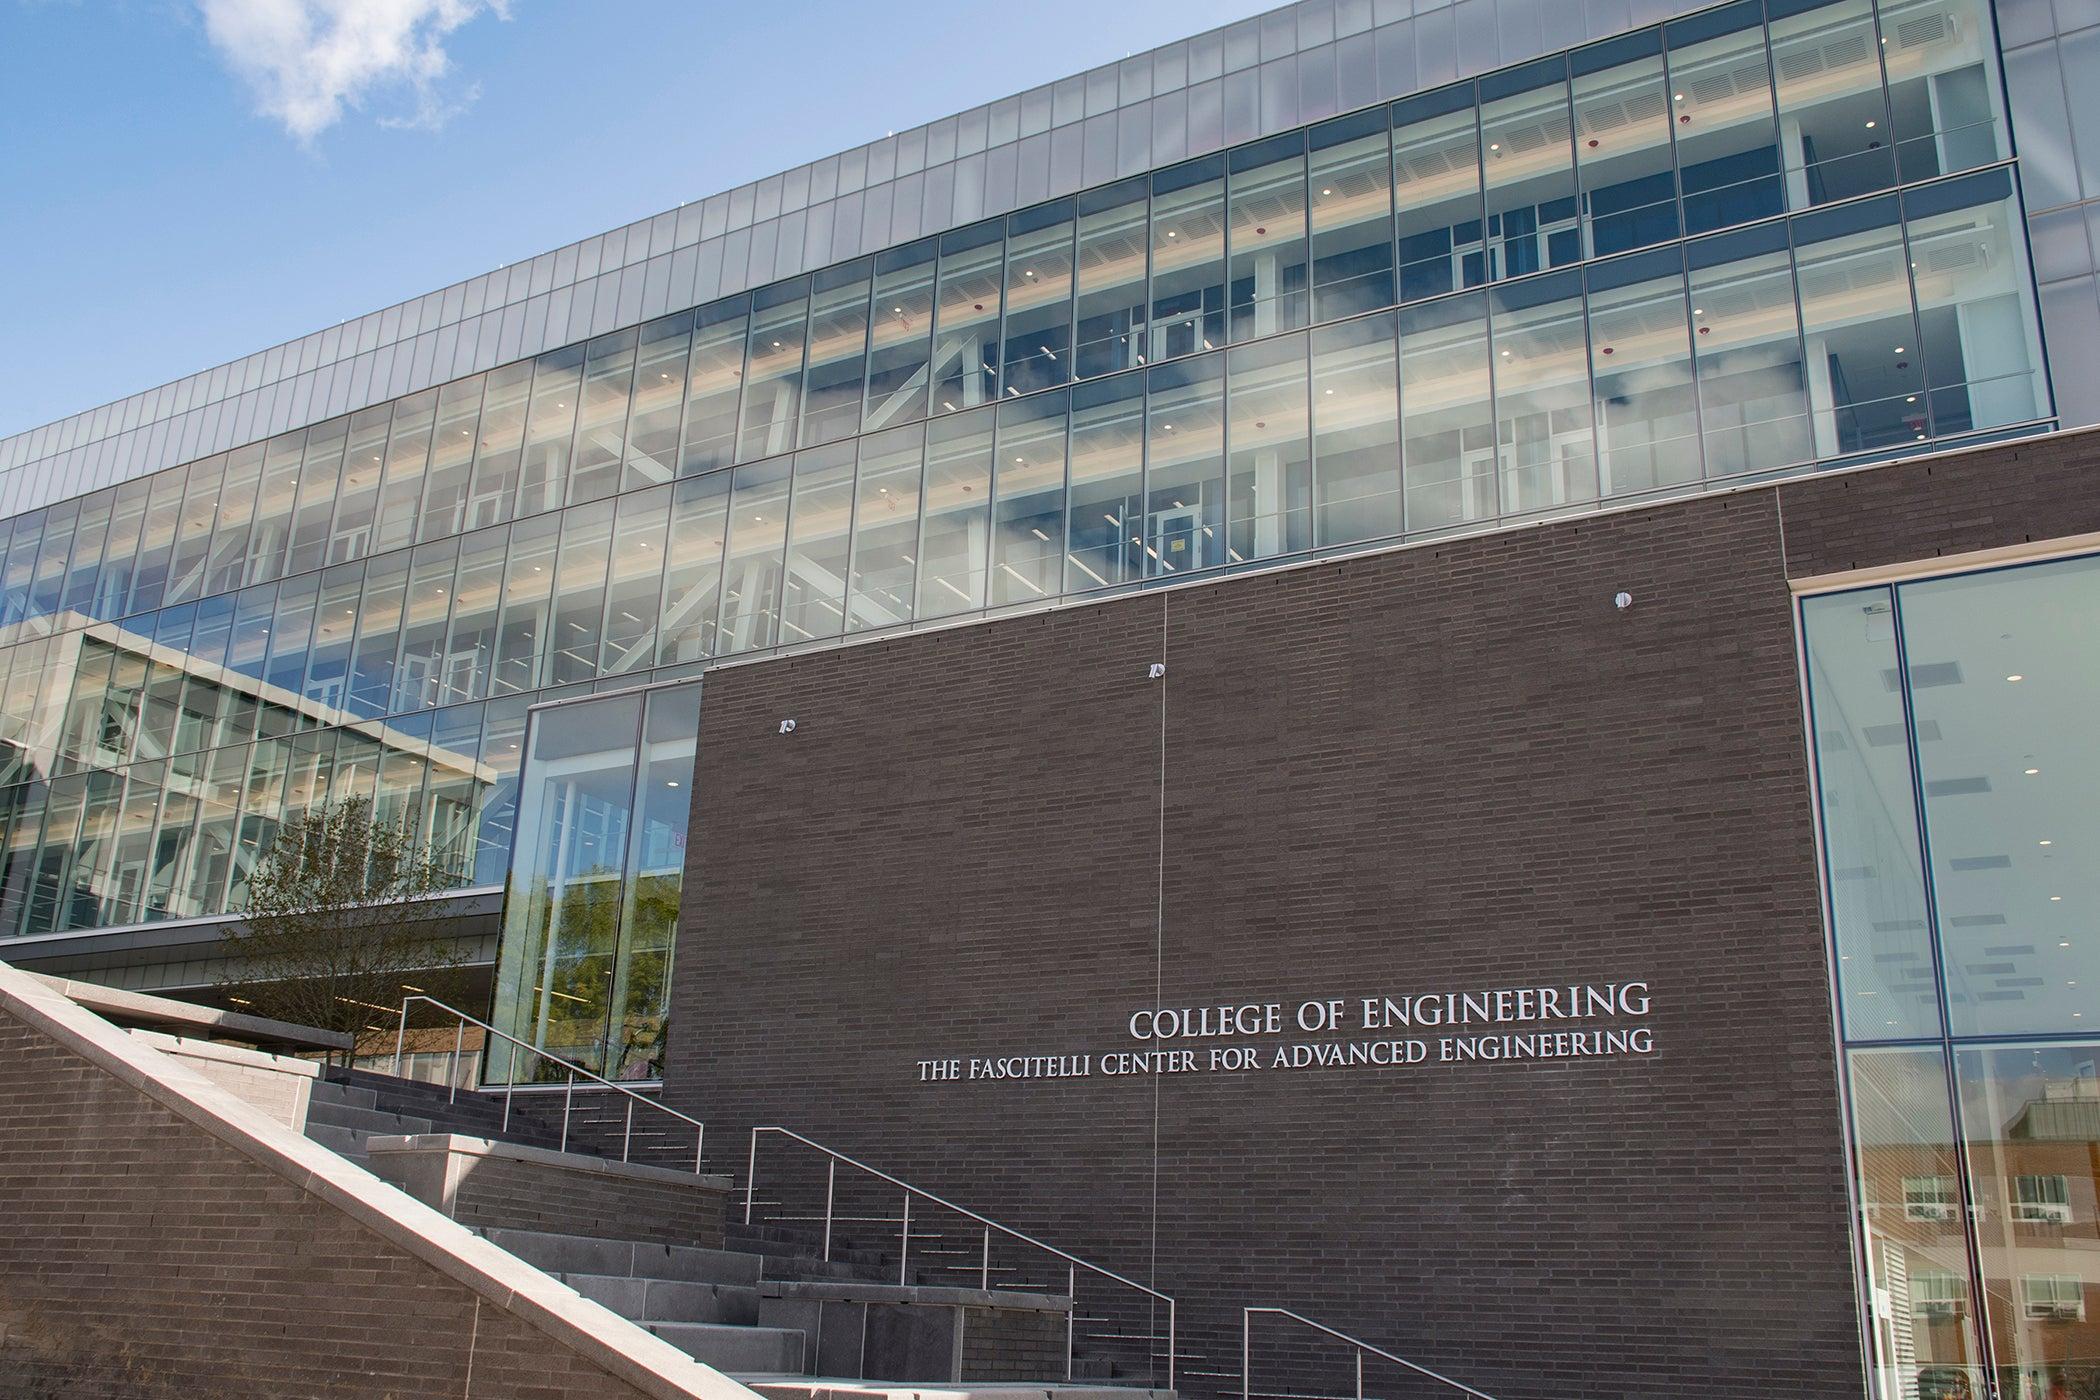 Fascitelli Center for Advanced Engineering